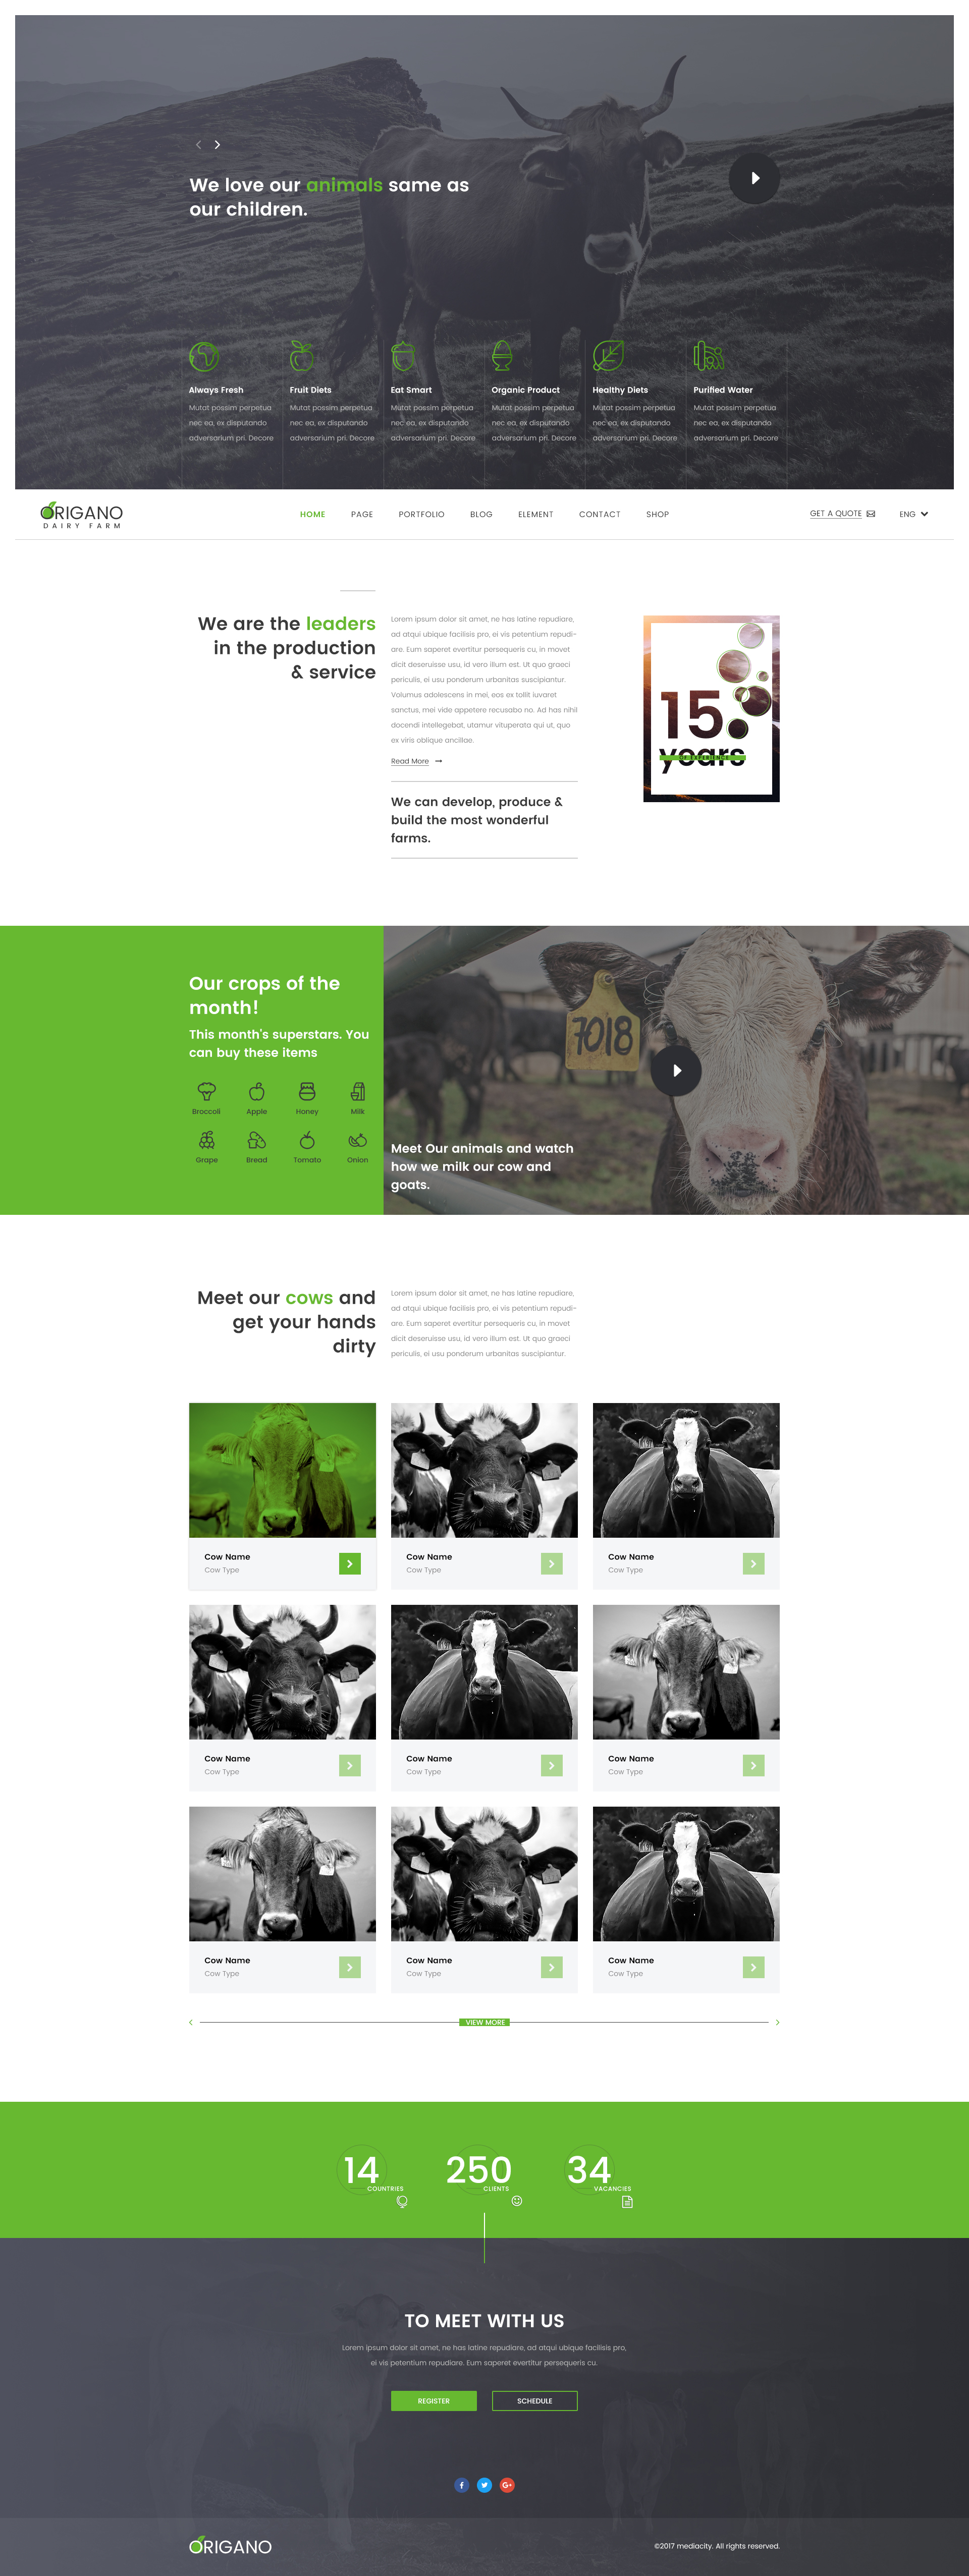 Origano - Organic Store HTML Template by media-city | ThemeForest